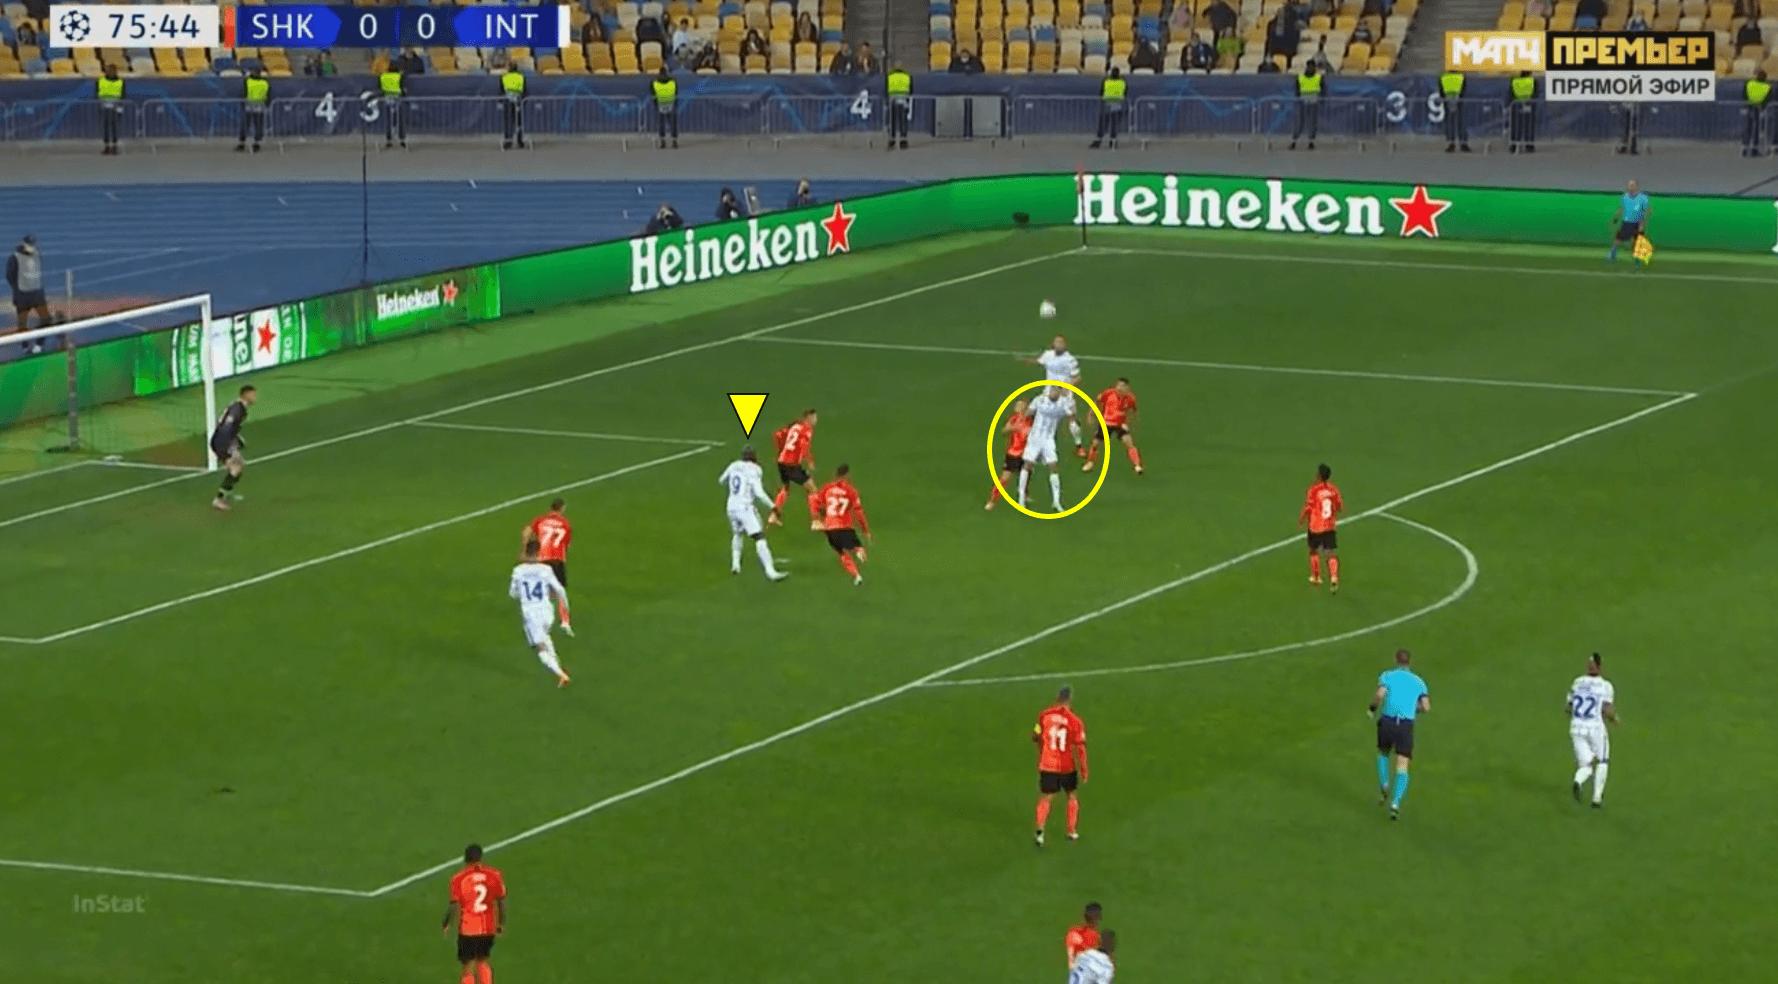 Champions League 2020/21: Shakhtar Donetsk vs Internazionale – Tactical Analysis tactics